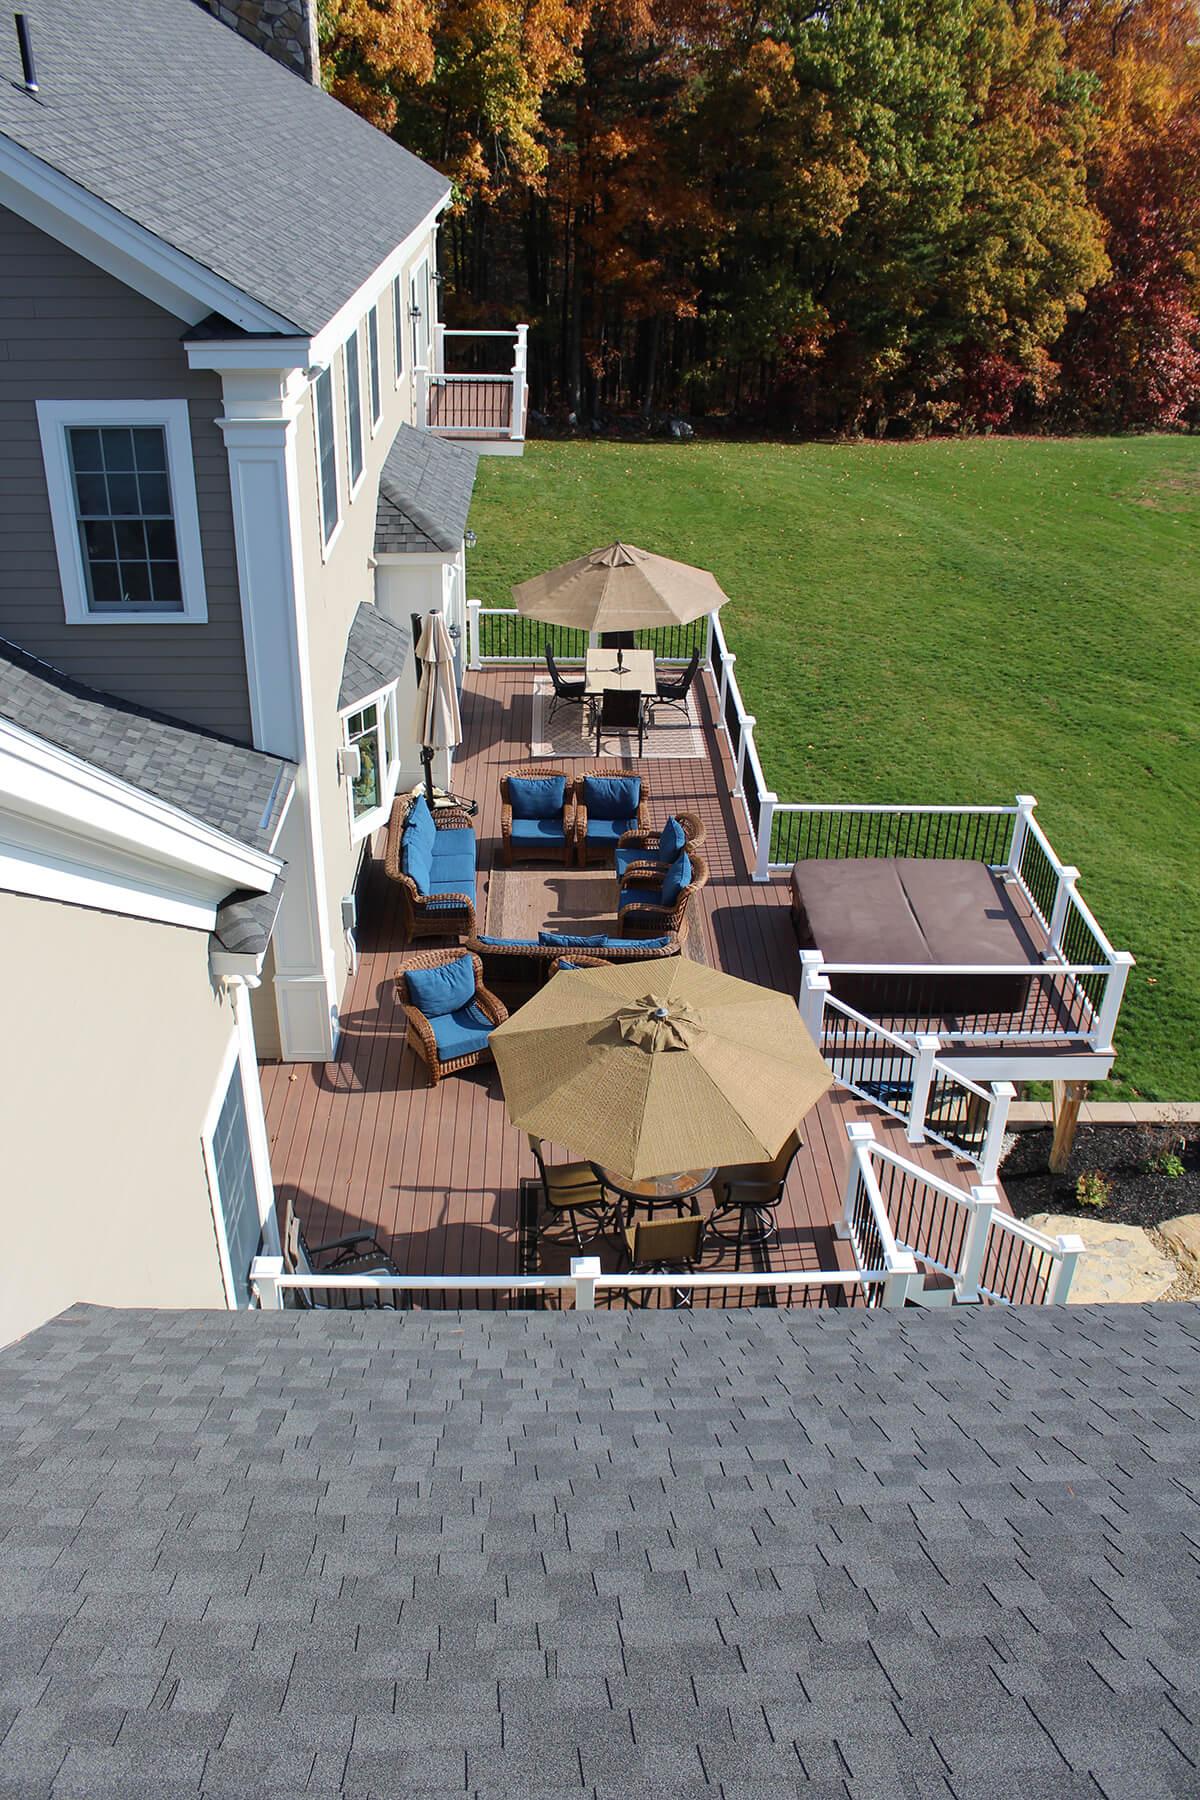 custom deck builder and design firm in acton massachusetts